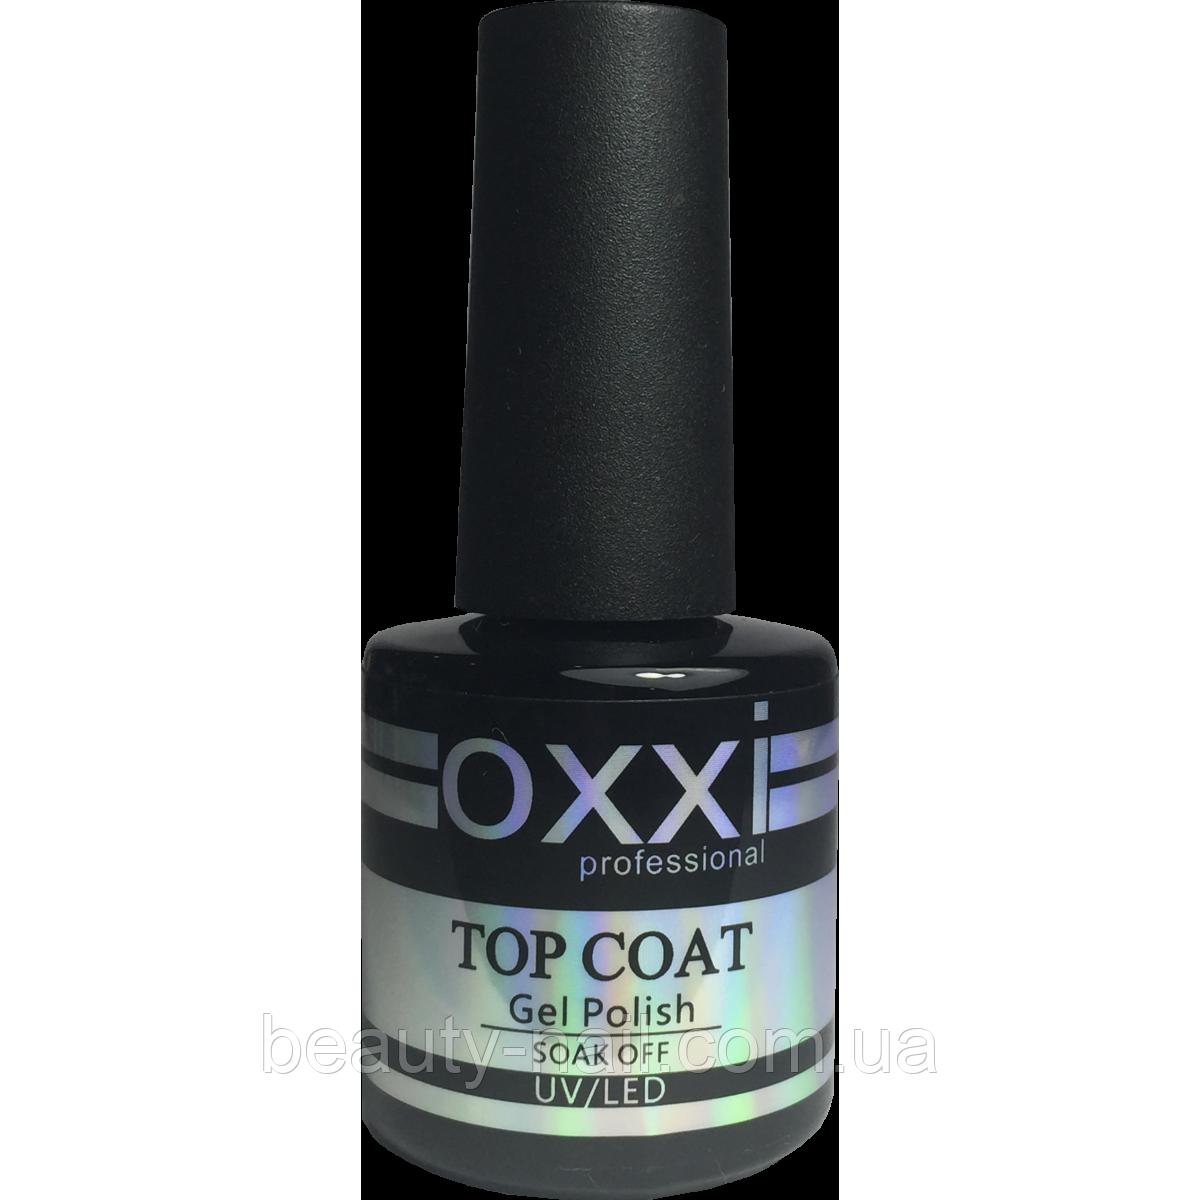 Oxxi professional финиш каучуковый 10 мл